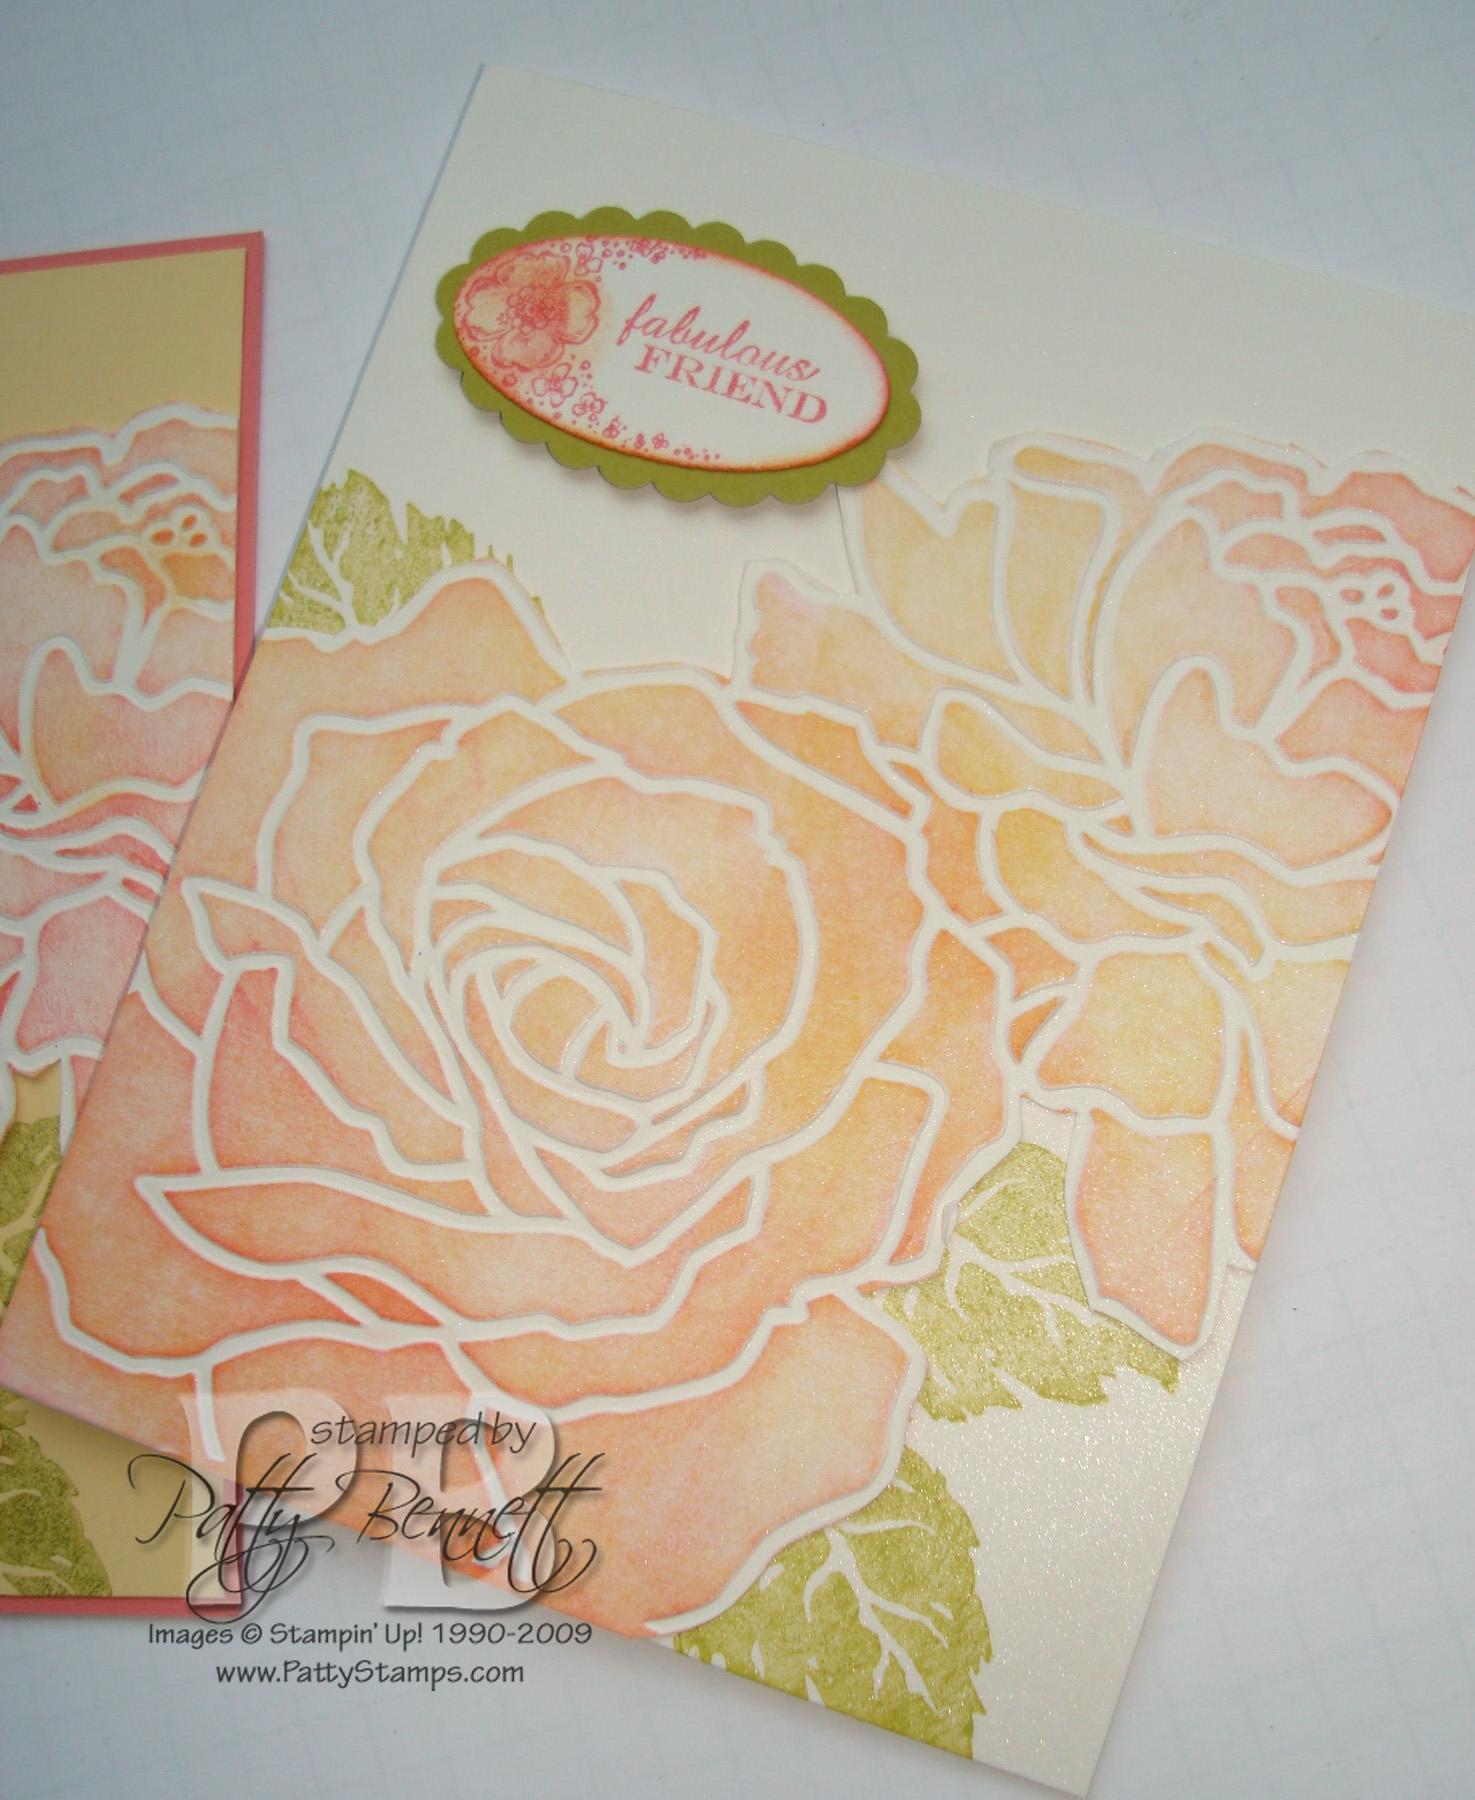 Peachy rose card